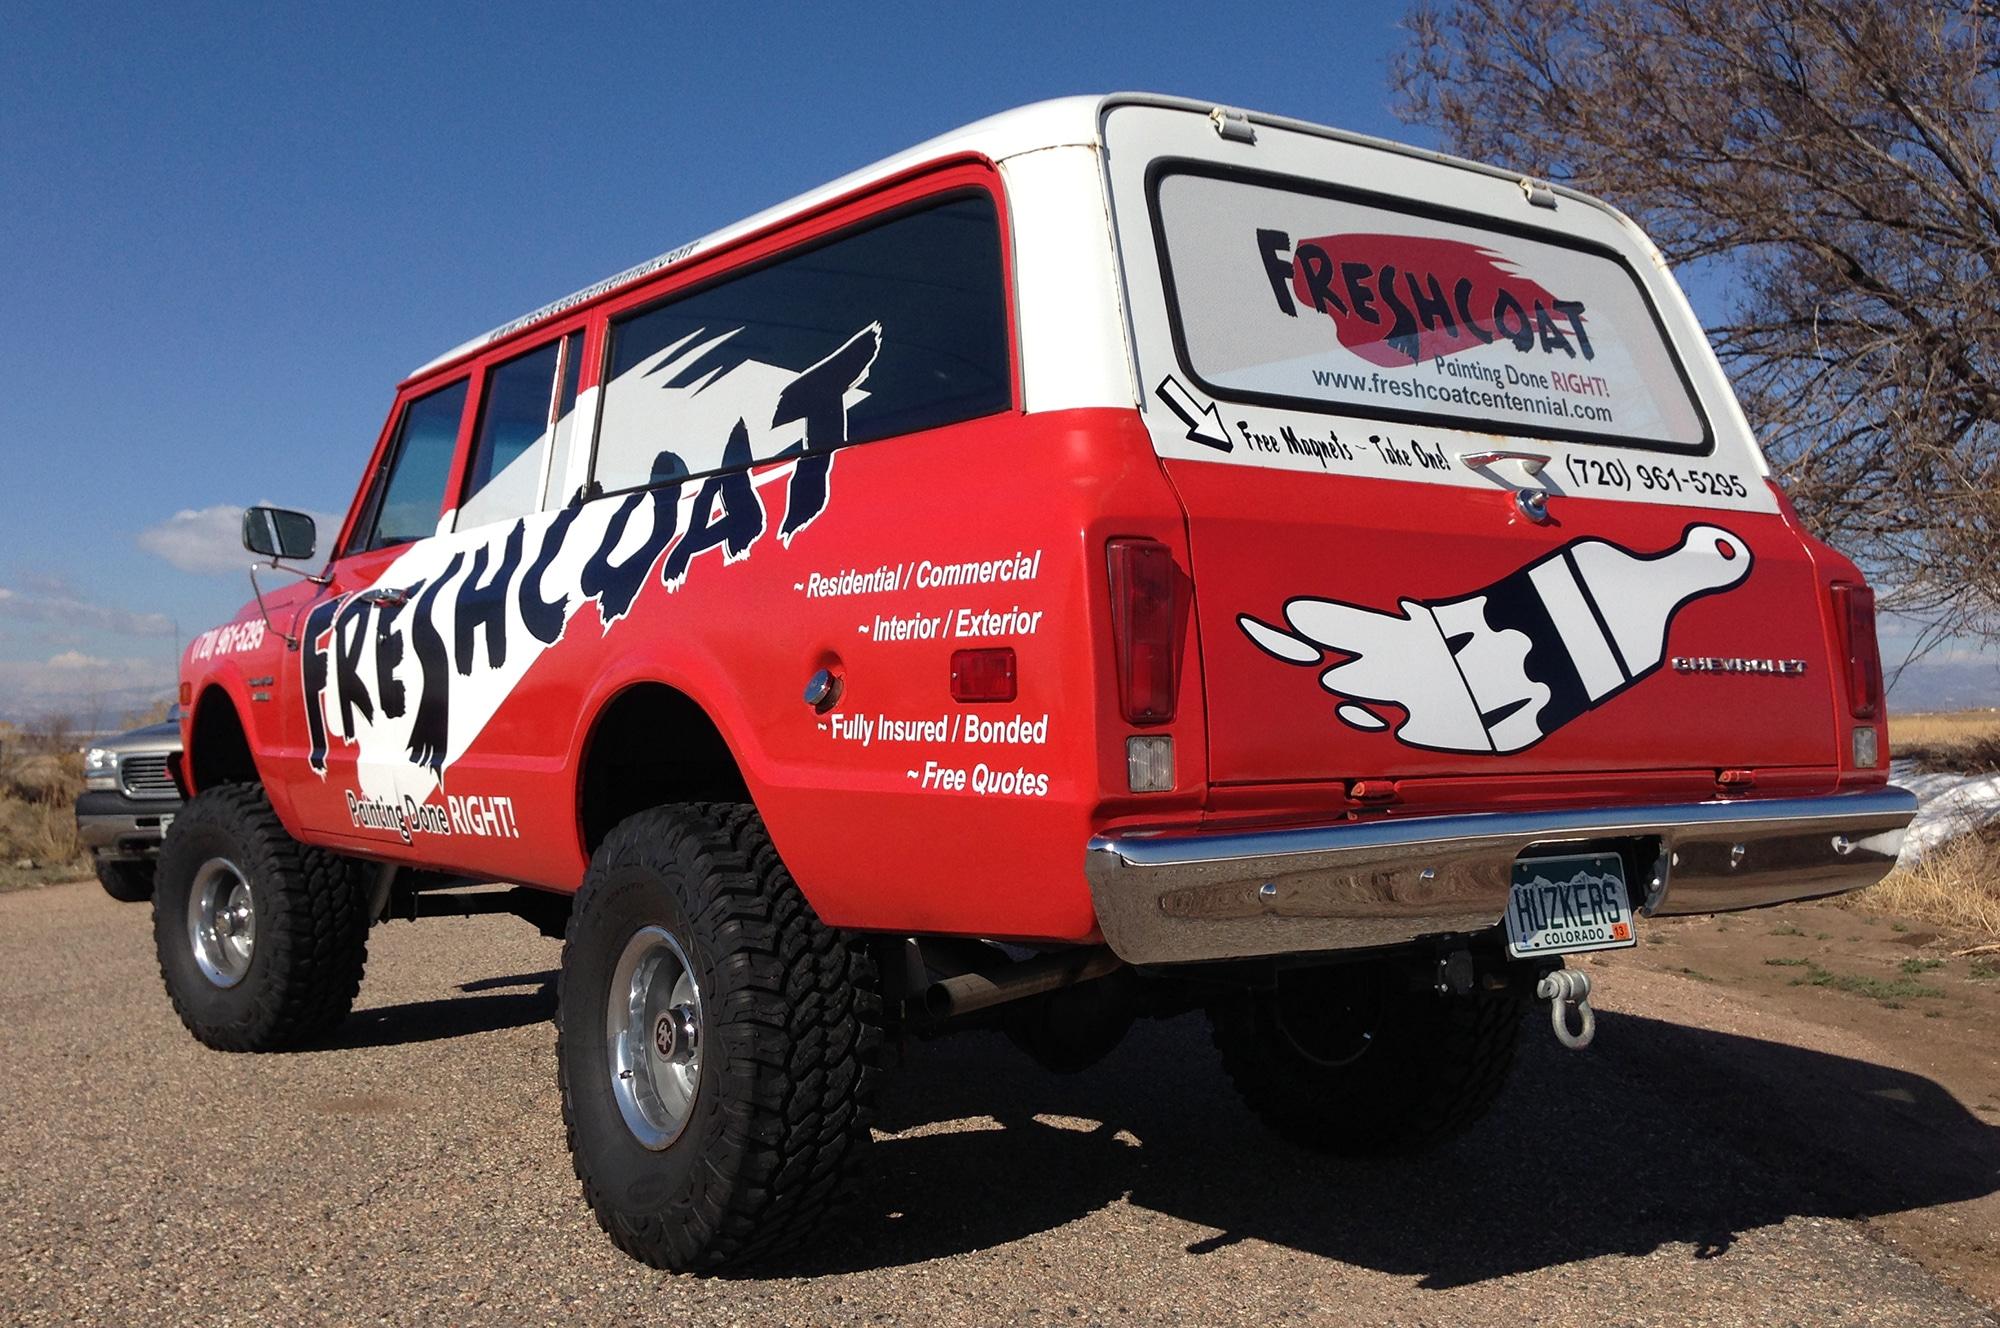 Commercial Vehicle Wraps Svi Graphics